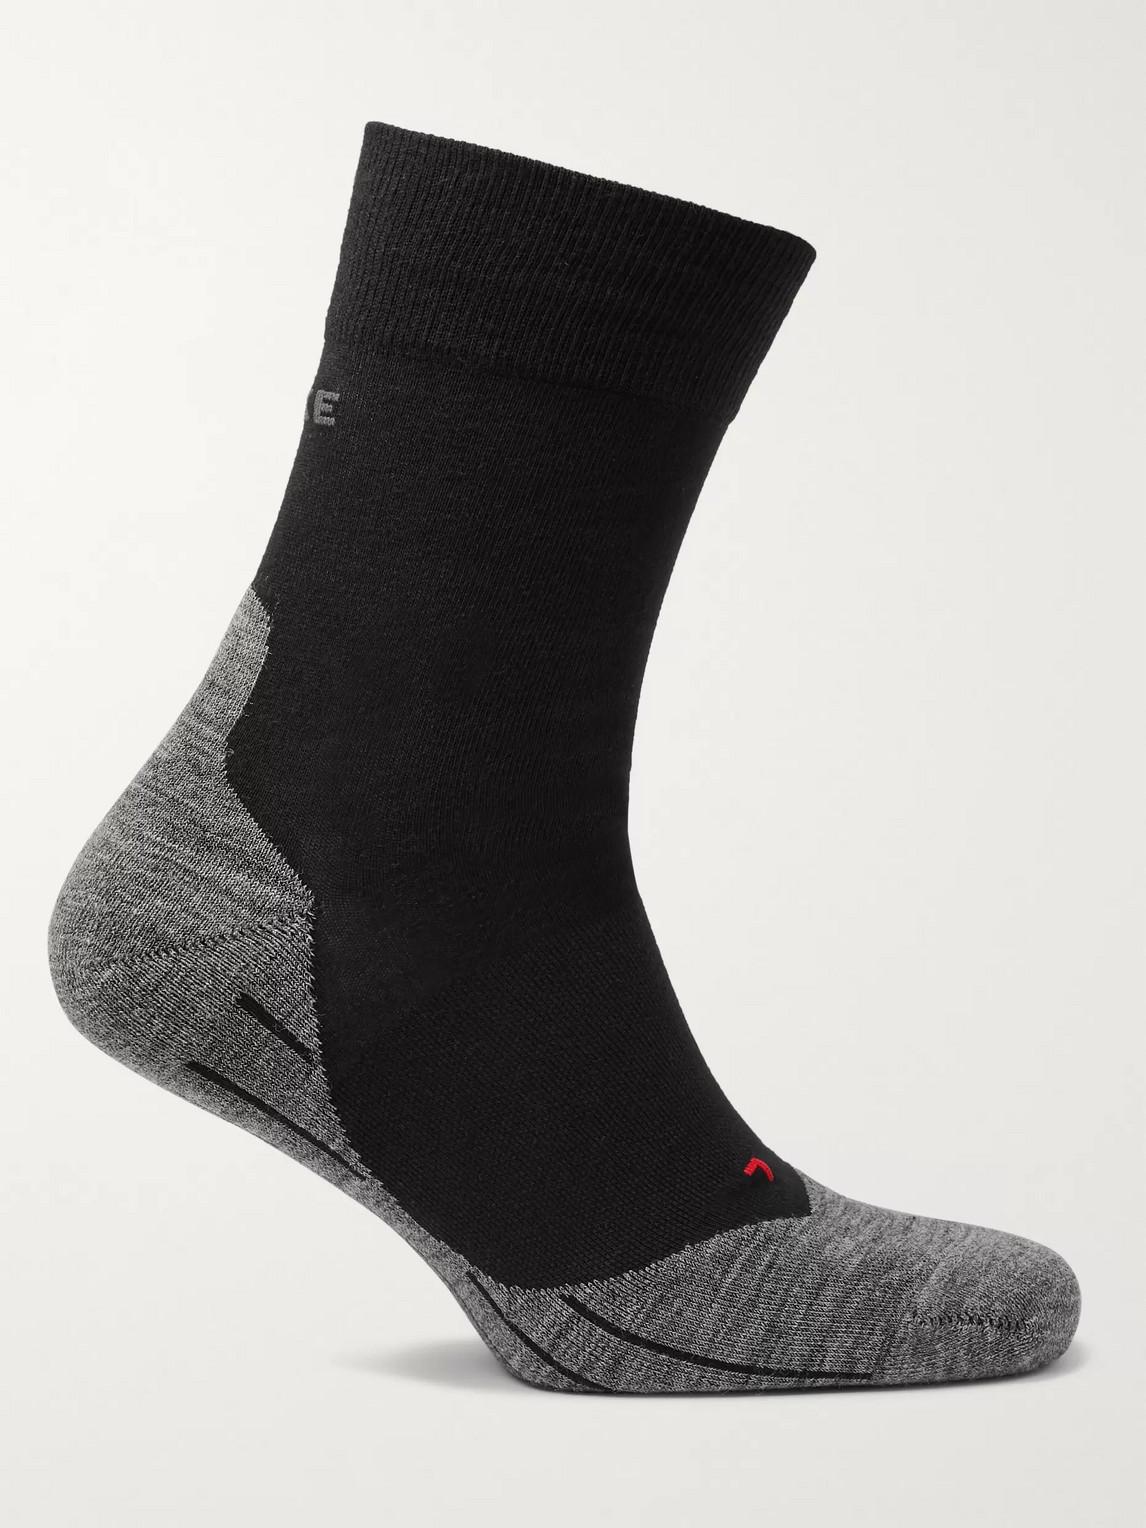 falke ergonomic sport system - ru4 stretch-knit socks - men - black